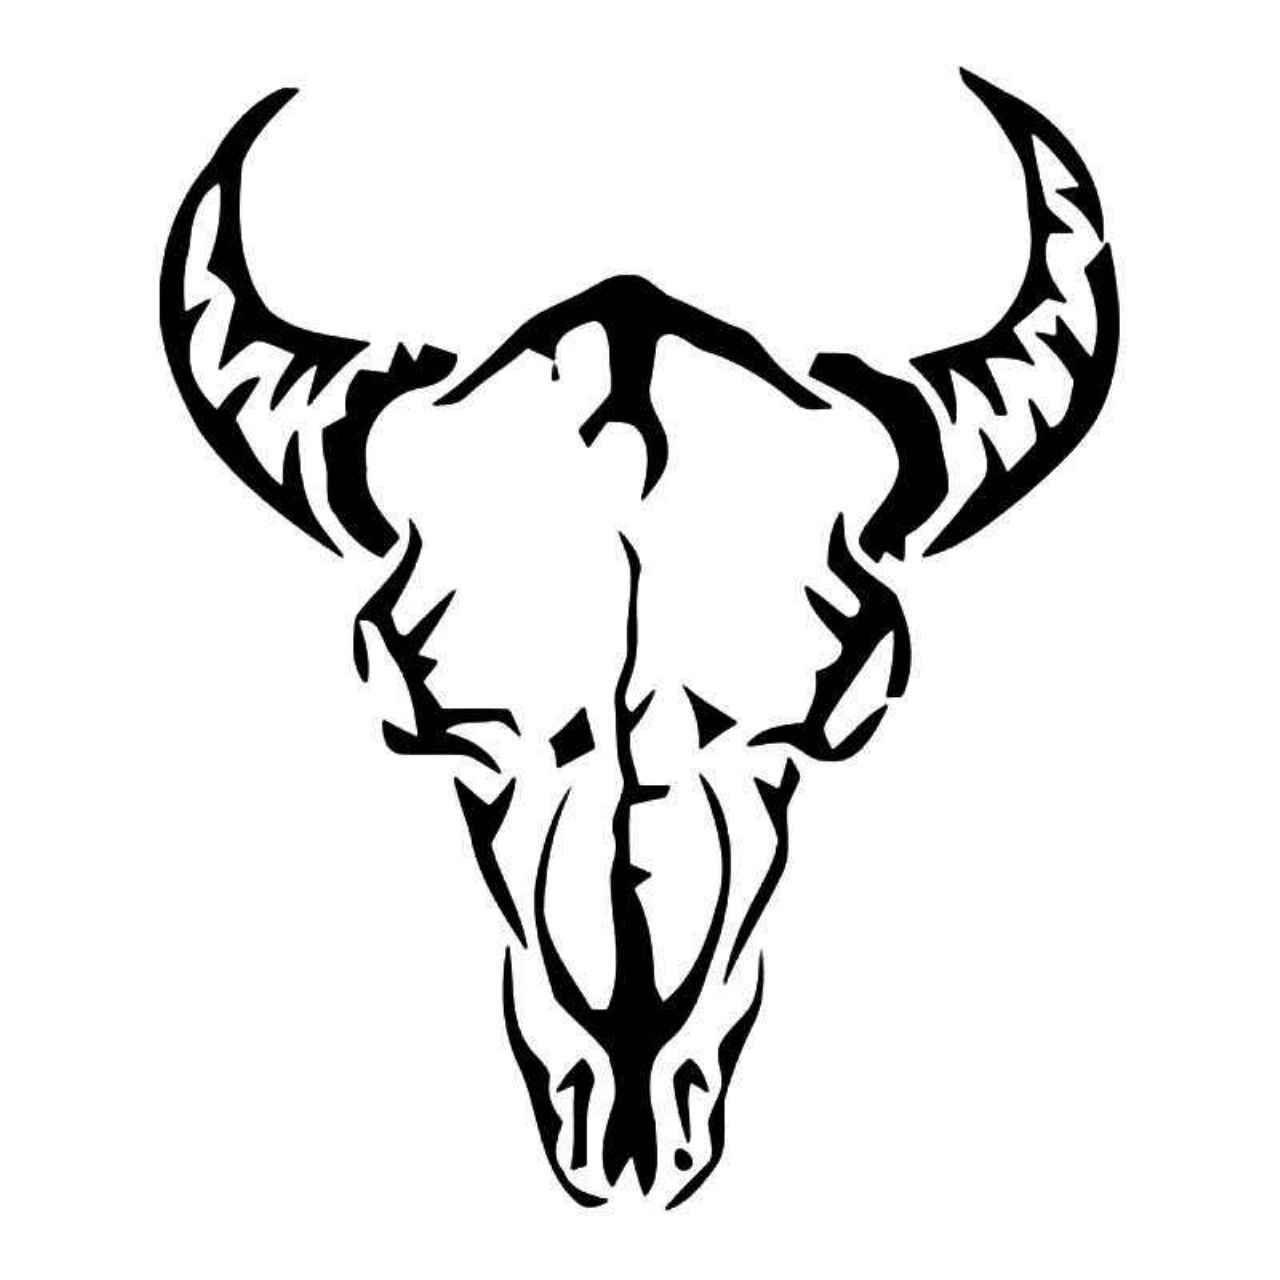 1280x1280 tribal longhorn cow skull vinyl decal sticker vinyl ideas cow